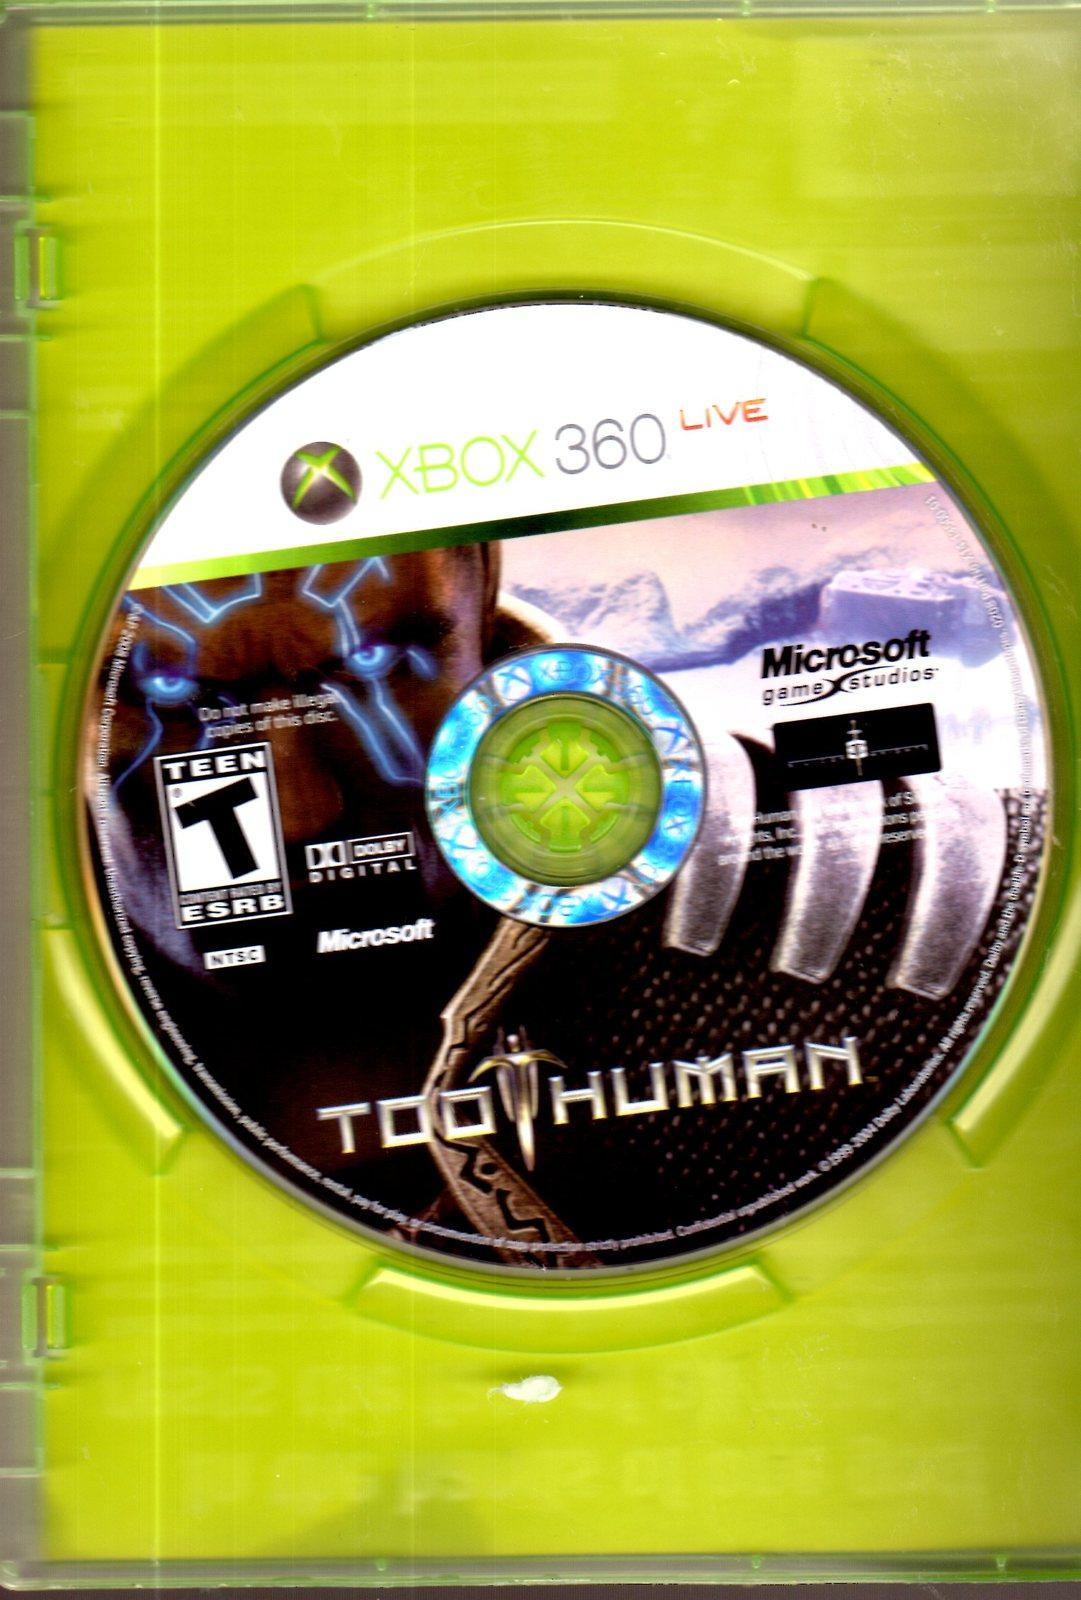 XBox 360 - Too Human